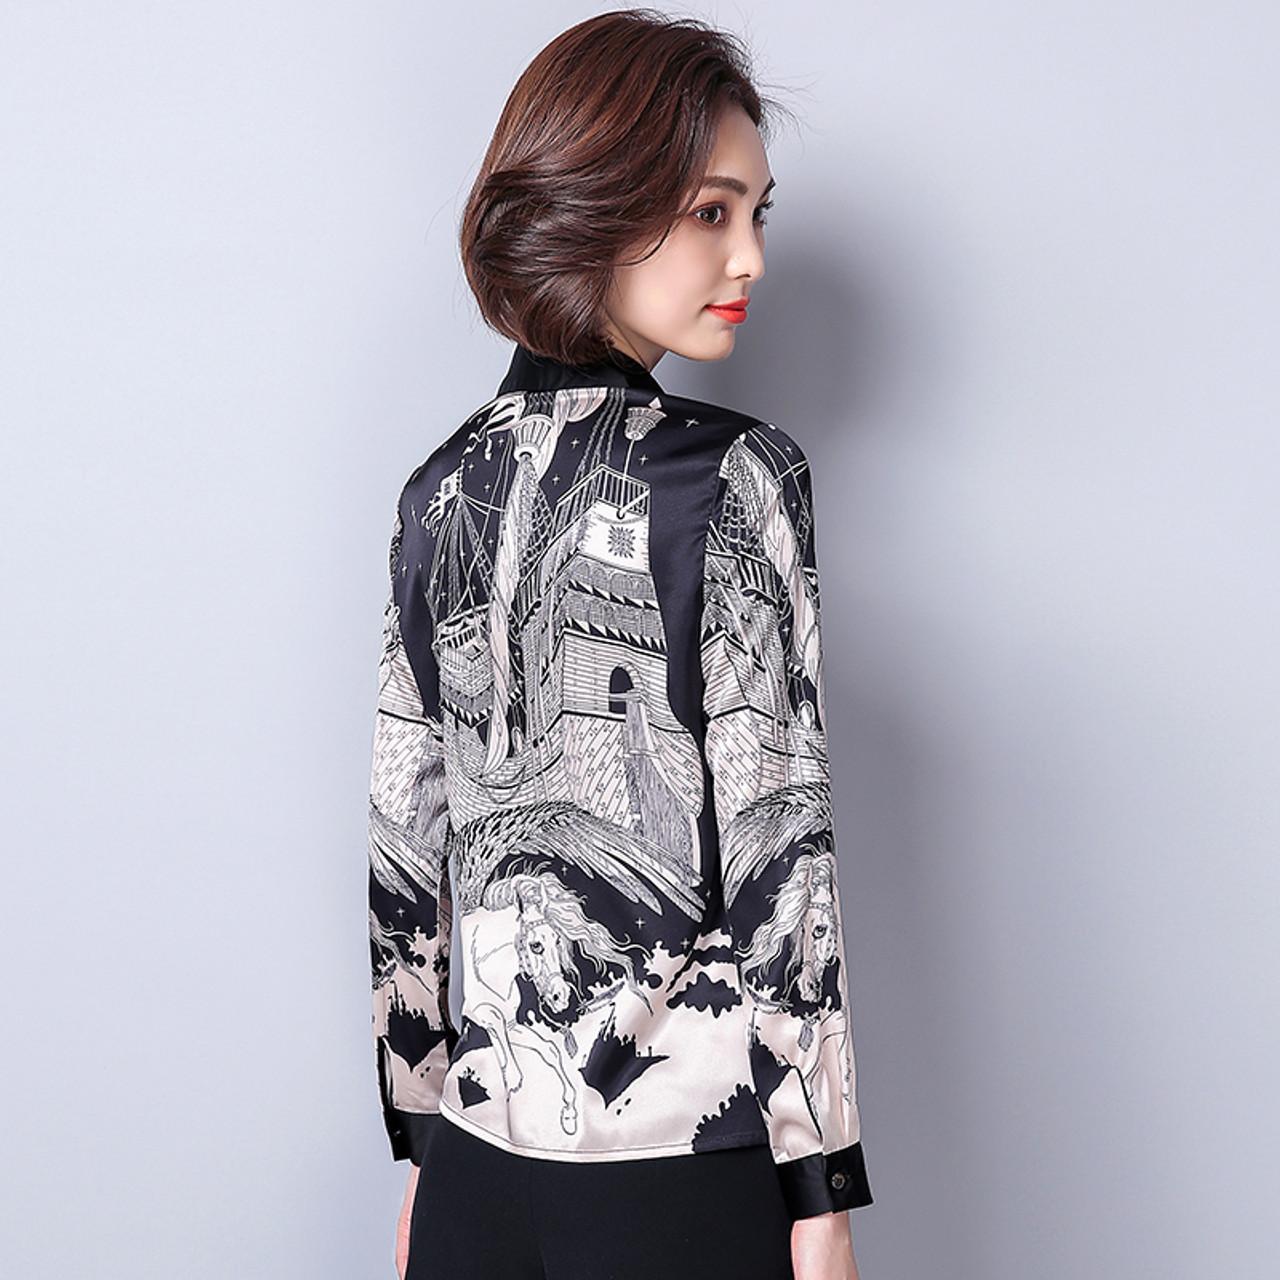 45af880d349d3 ... New Arrival 2018 Spring Female Imitation Silk Satin Blouse Slim Women s  Printing Shirt Long Sleeve Plus ...